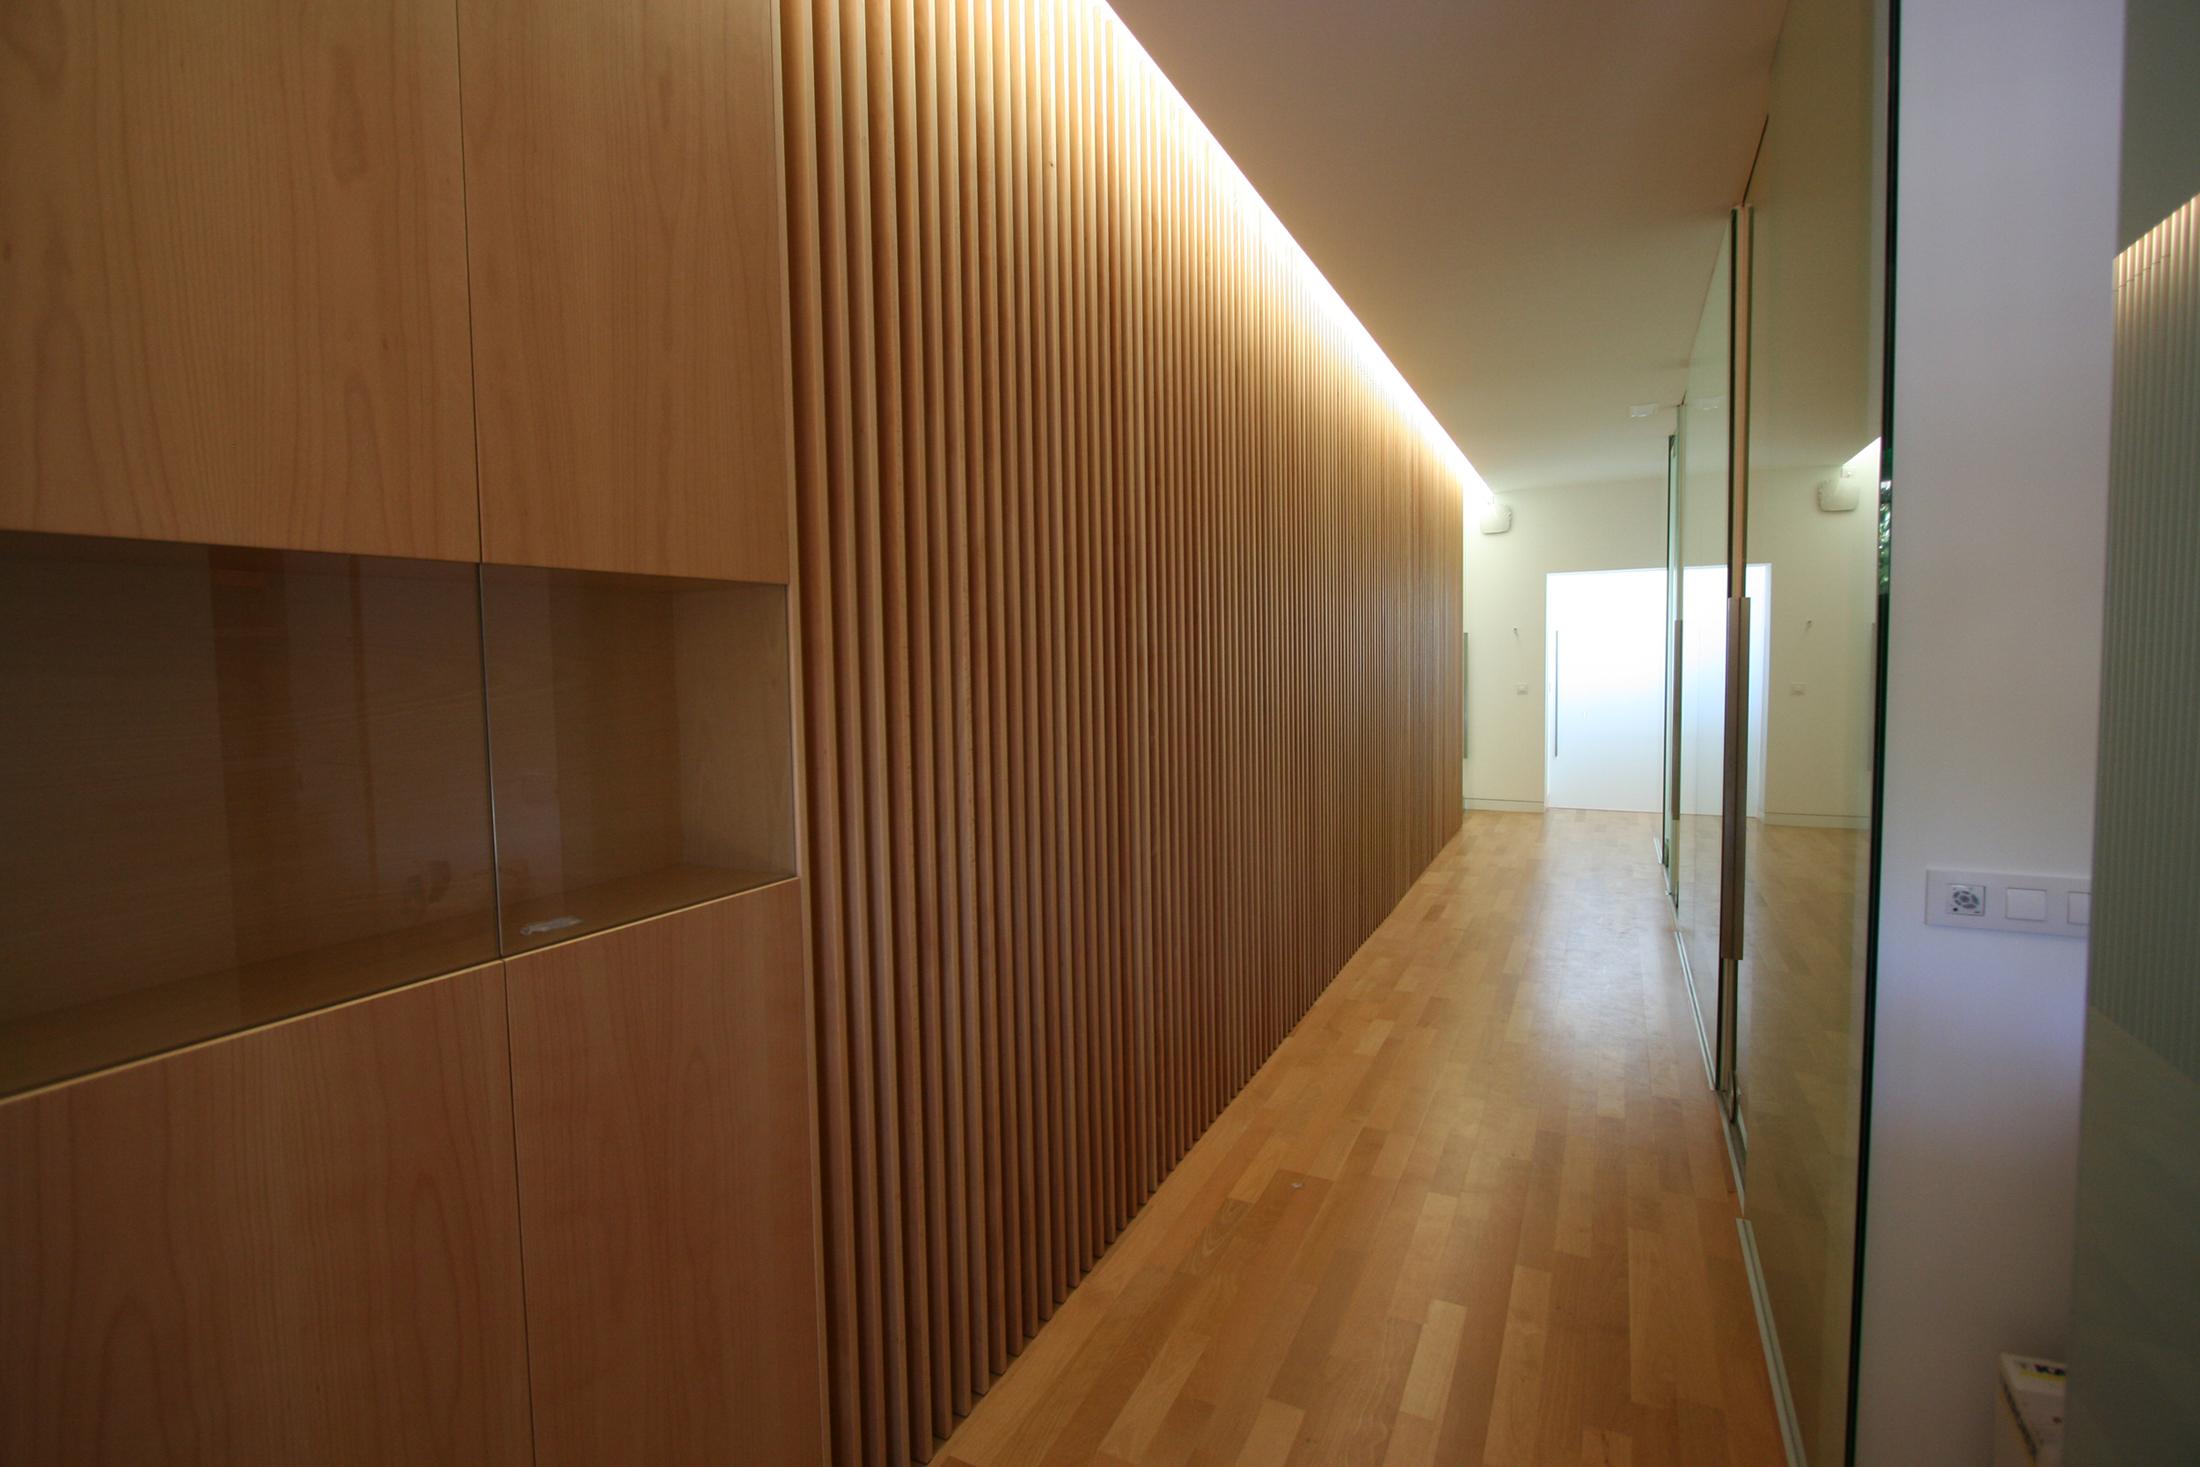 Physiotherapy clinic innova eau arquitectura archello - Eau arquitectura ...